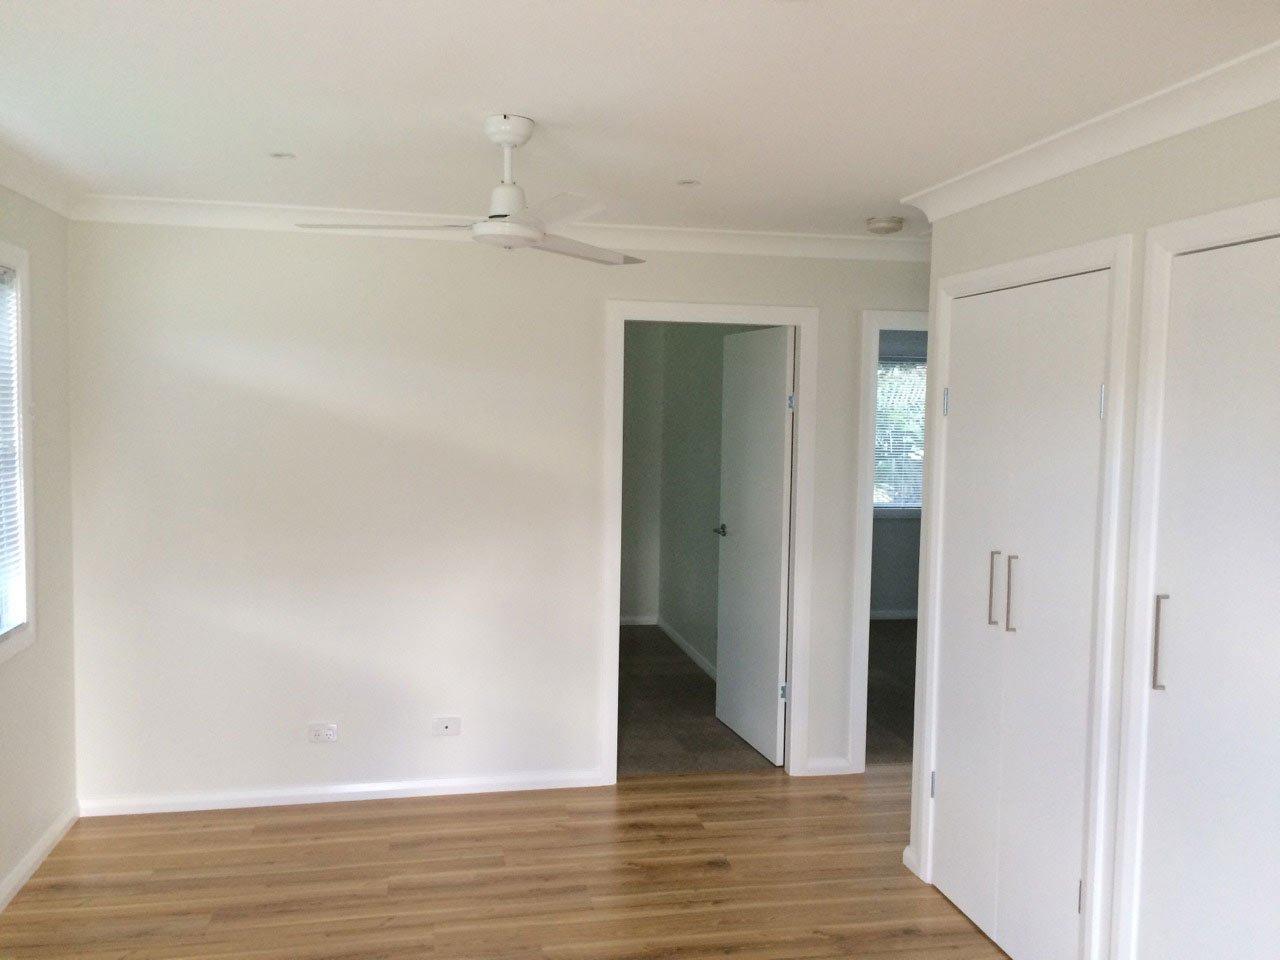 lt drafting newcastle granny flat ross street belmont interior